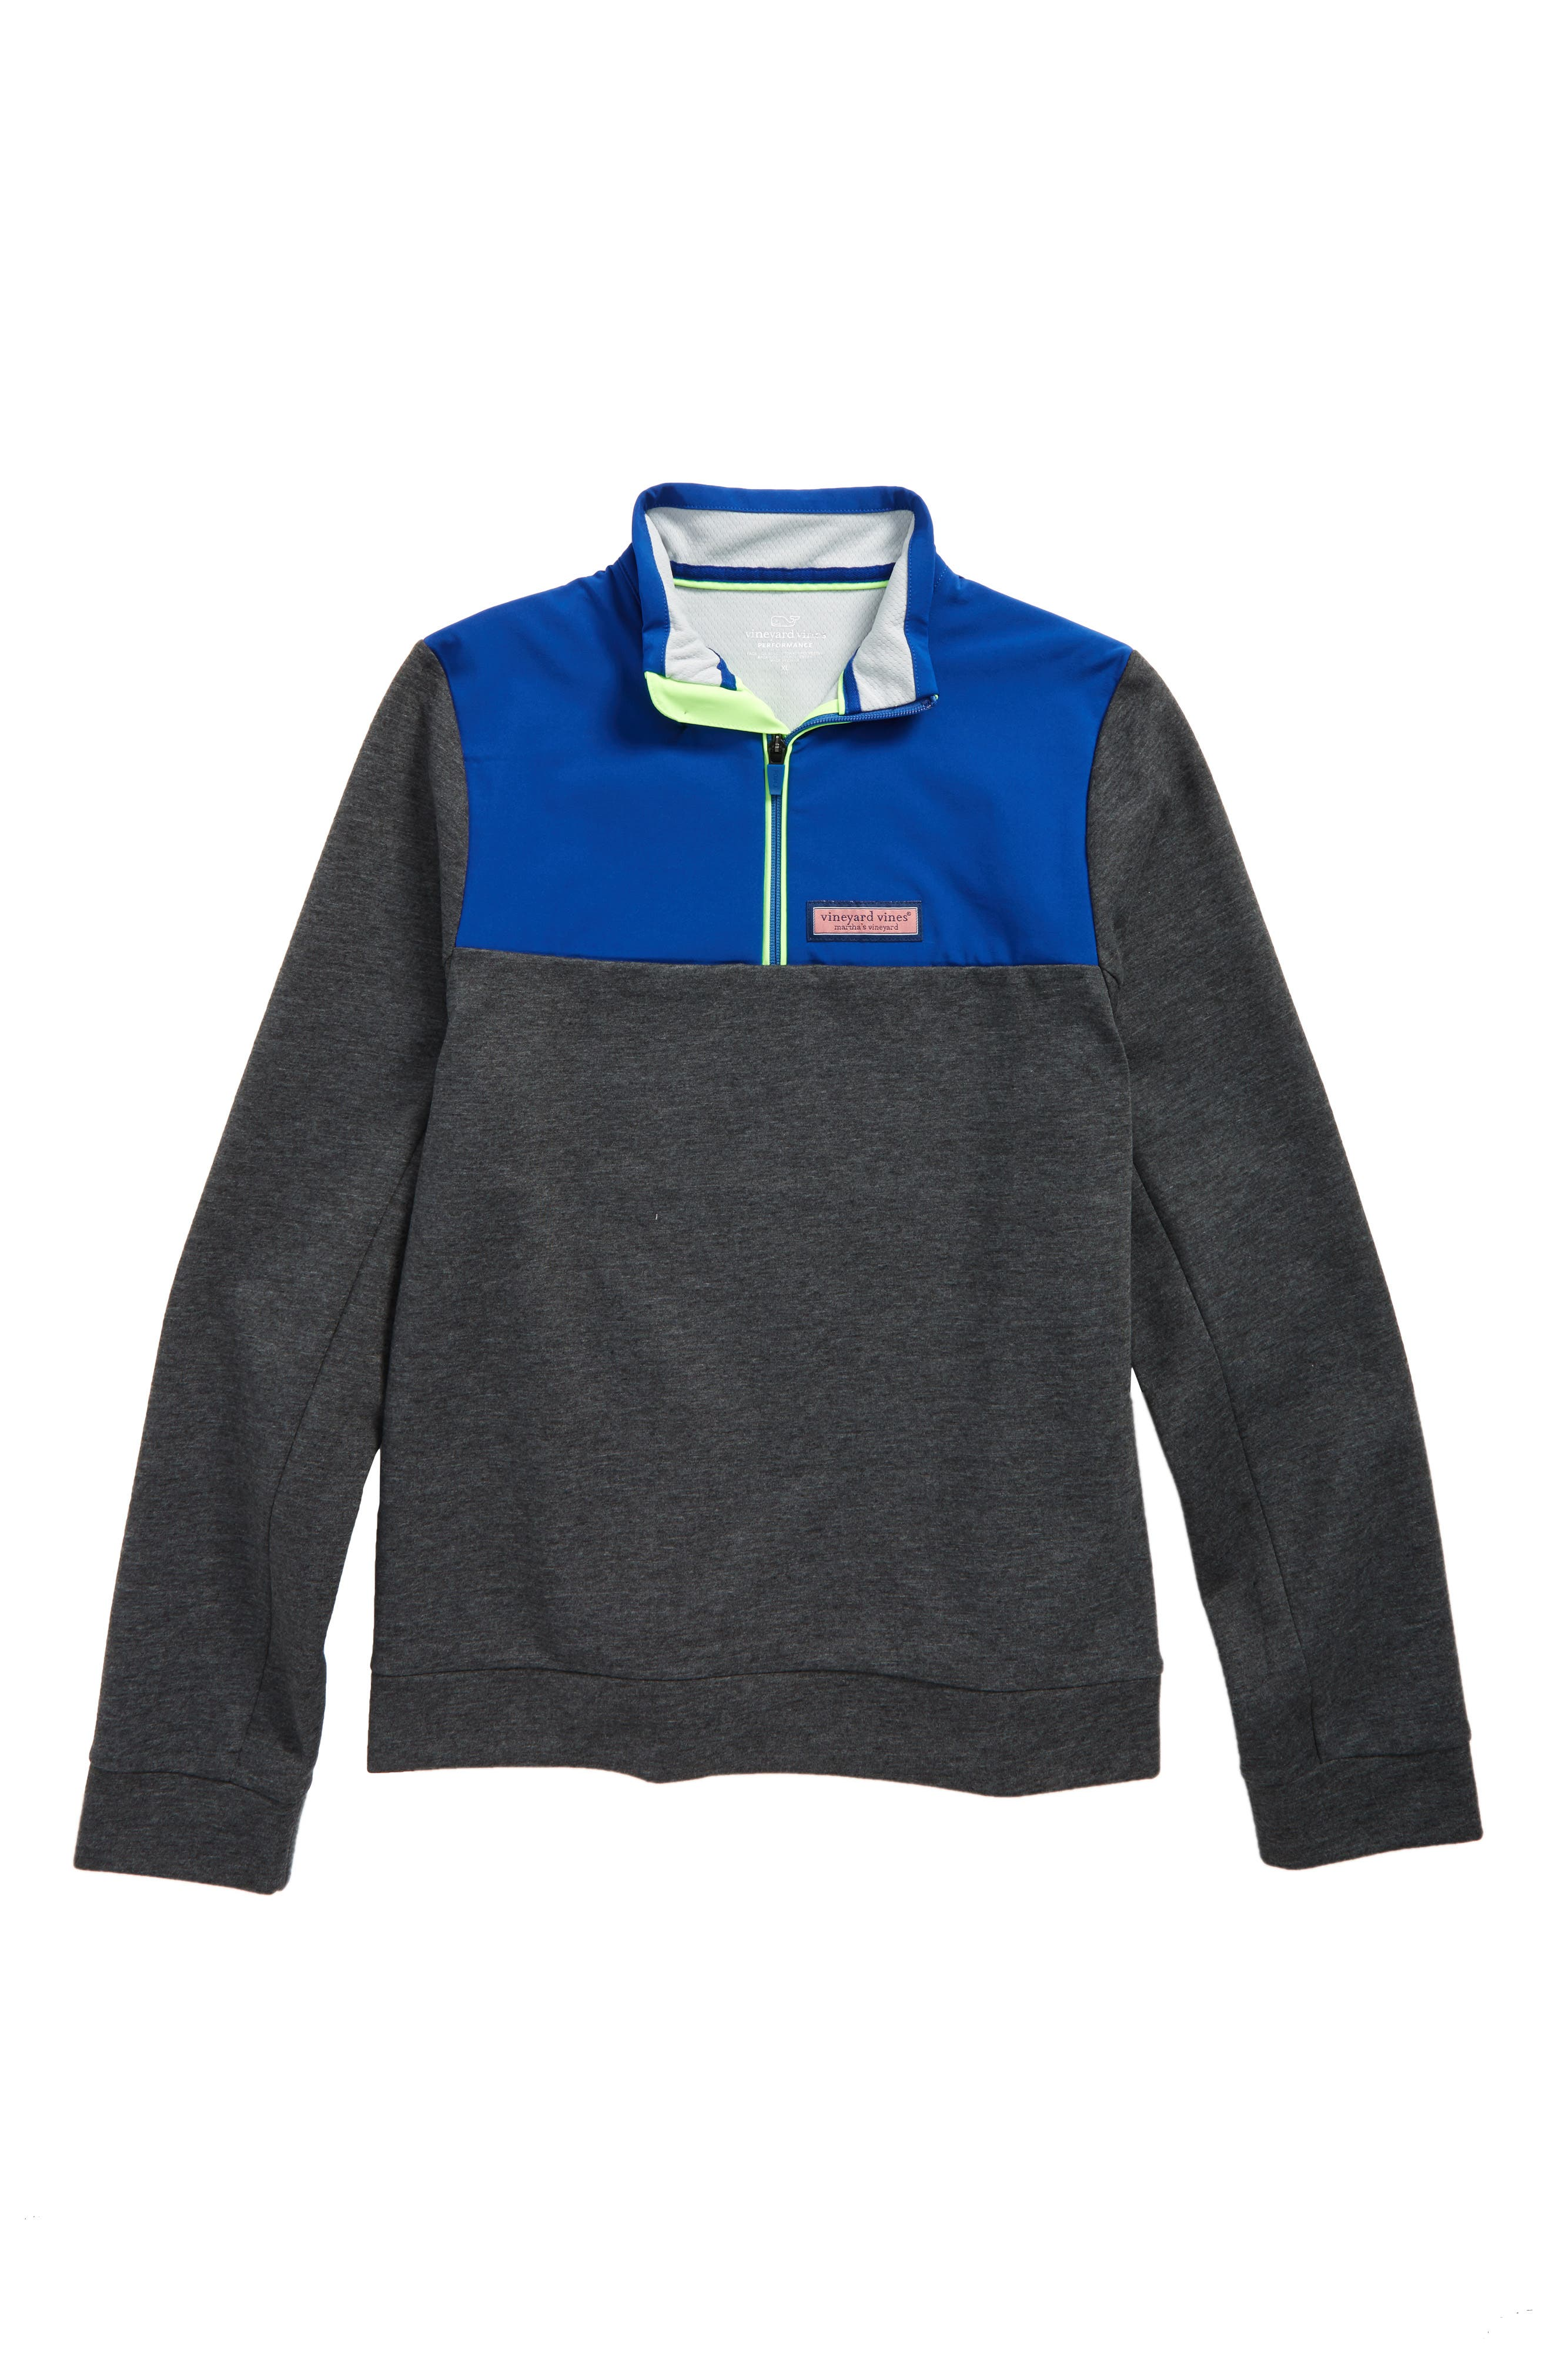 Shep Colorblock Quarter Zip Pullover,                             Main thumbnail 1, color,                             020